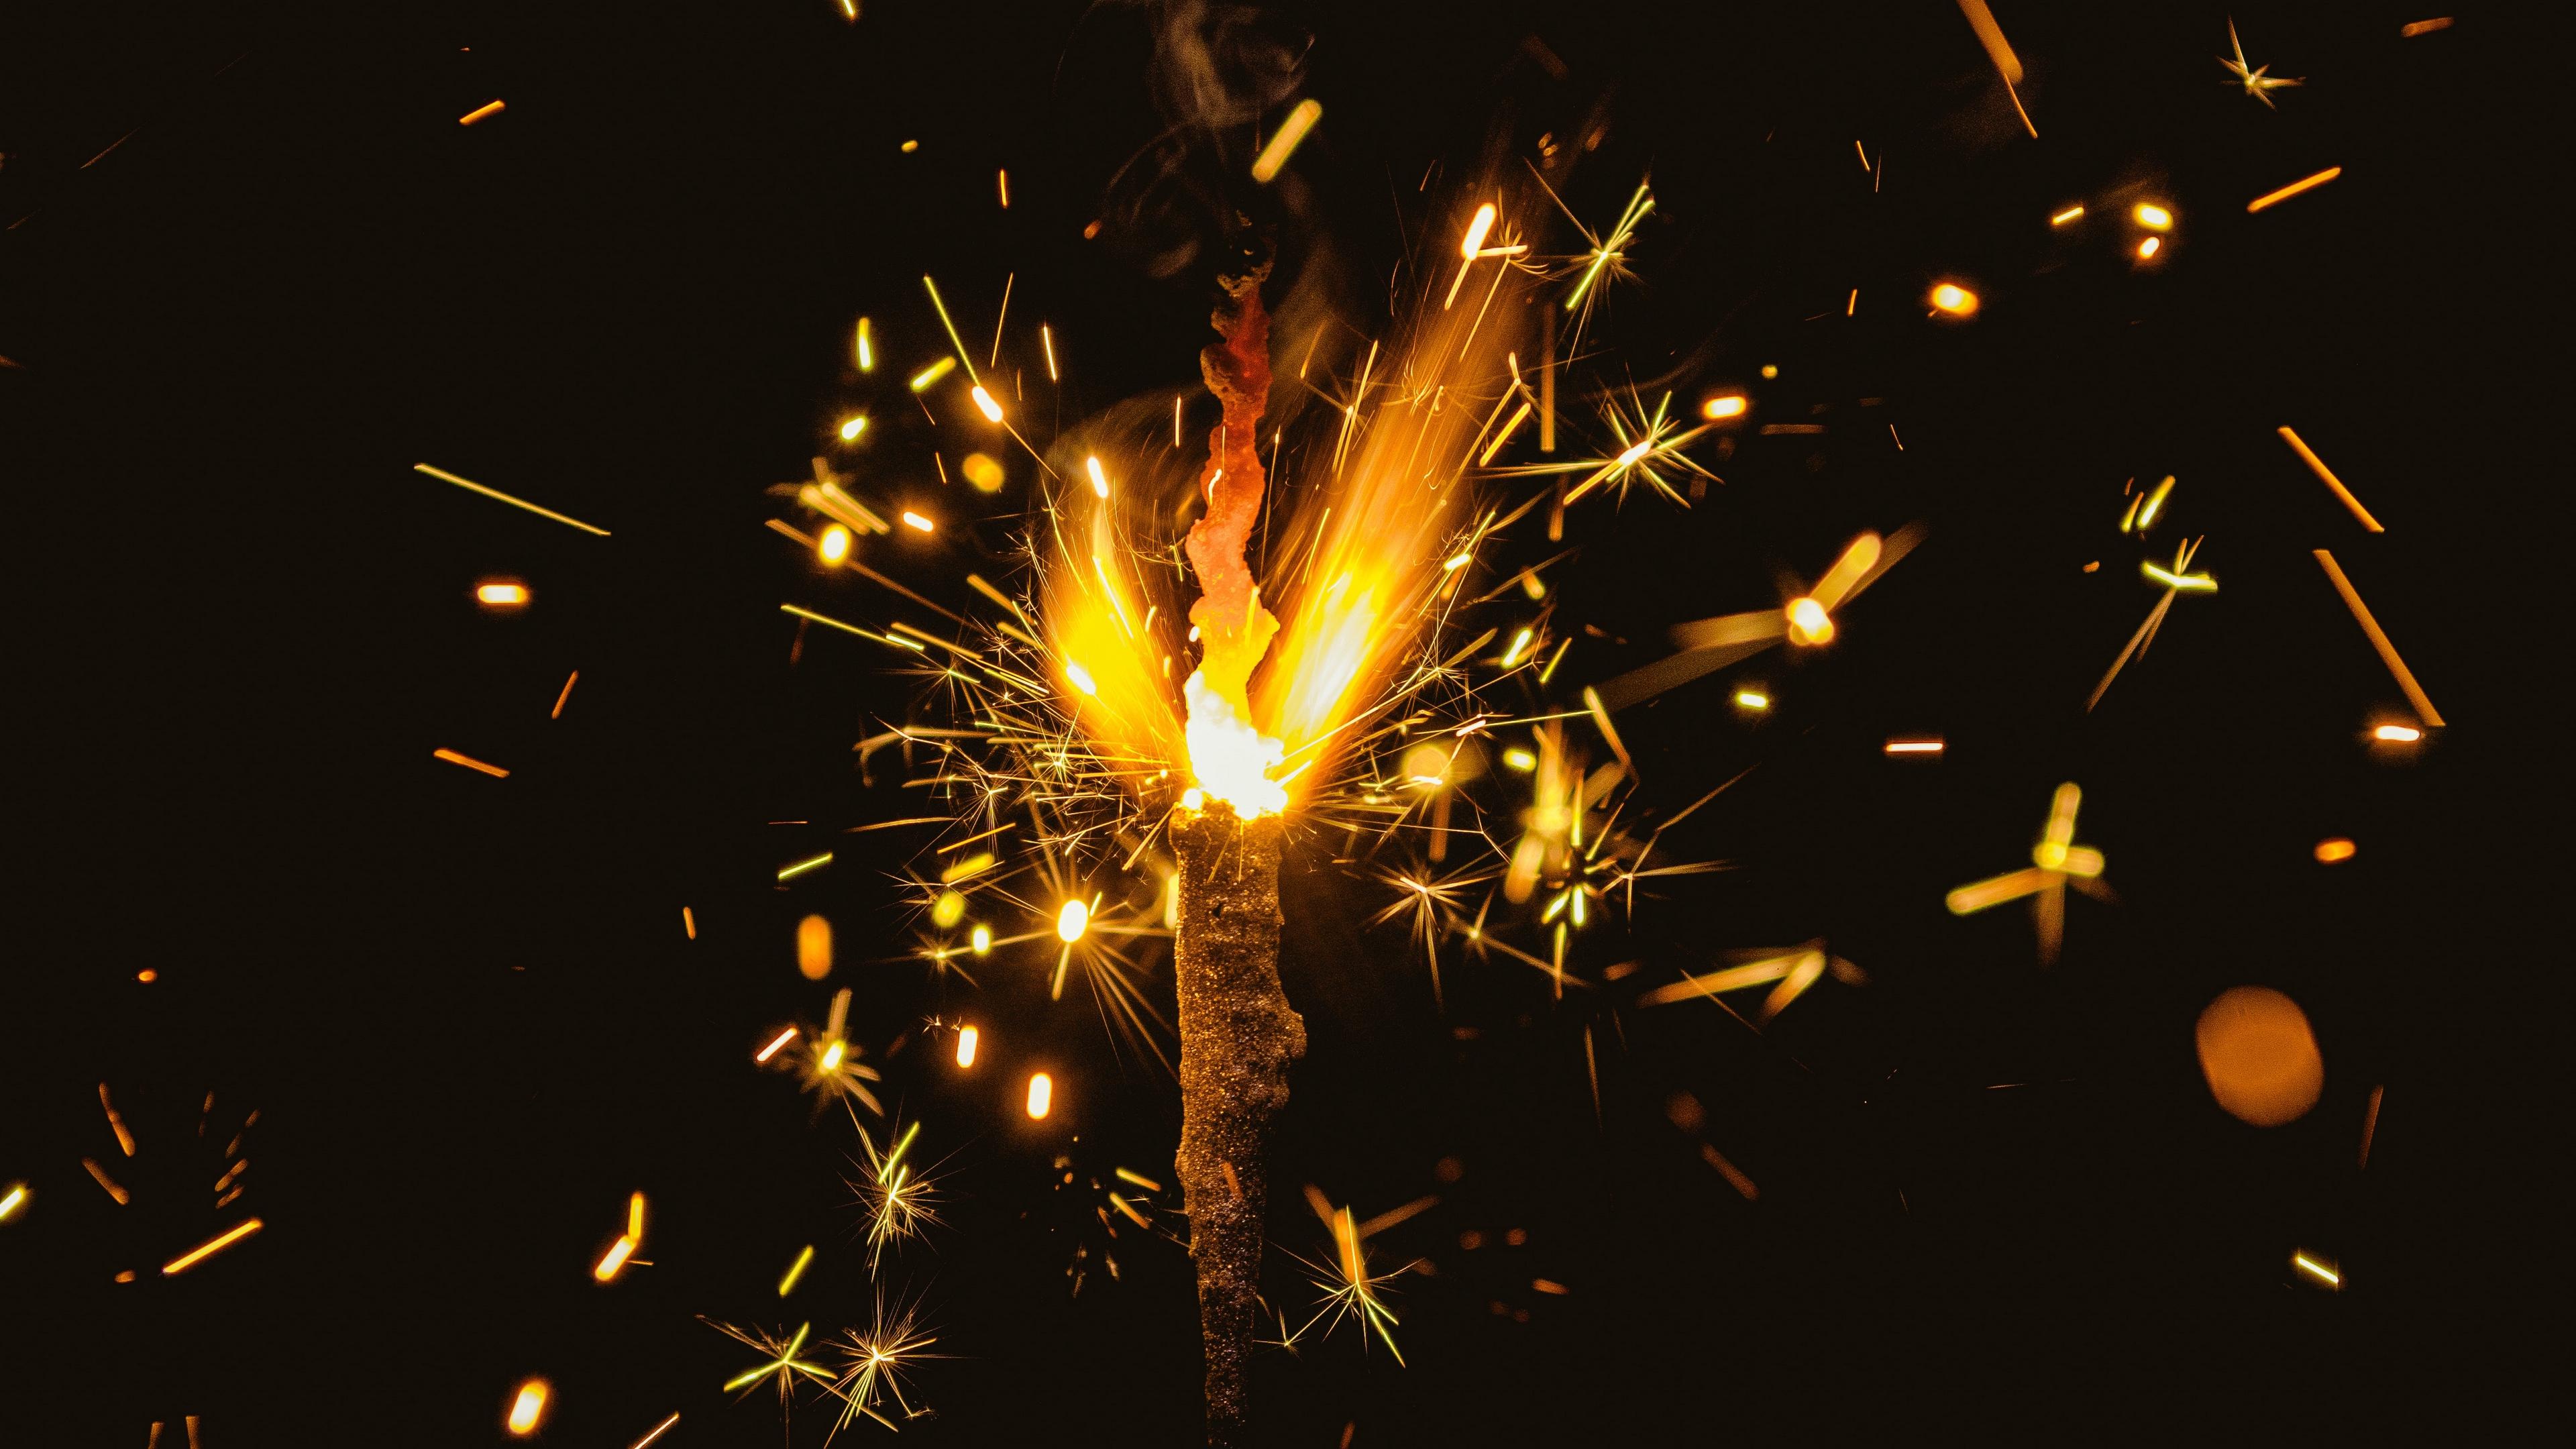 bengal fire sparks glitter dark background 4k 1538345073 - bengal fire, sparks, glitter, dark background 4k - Sparks, Glitter, bengal fire